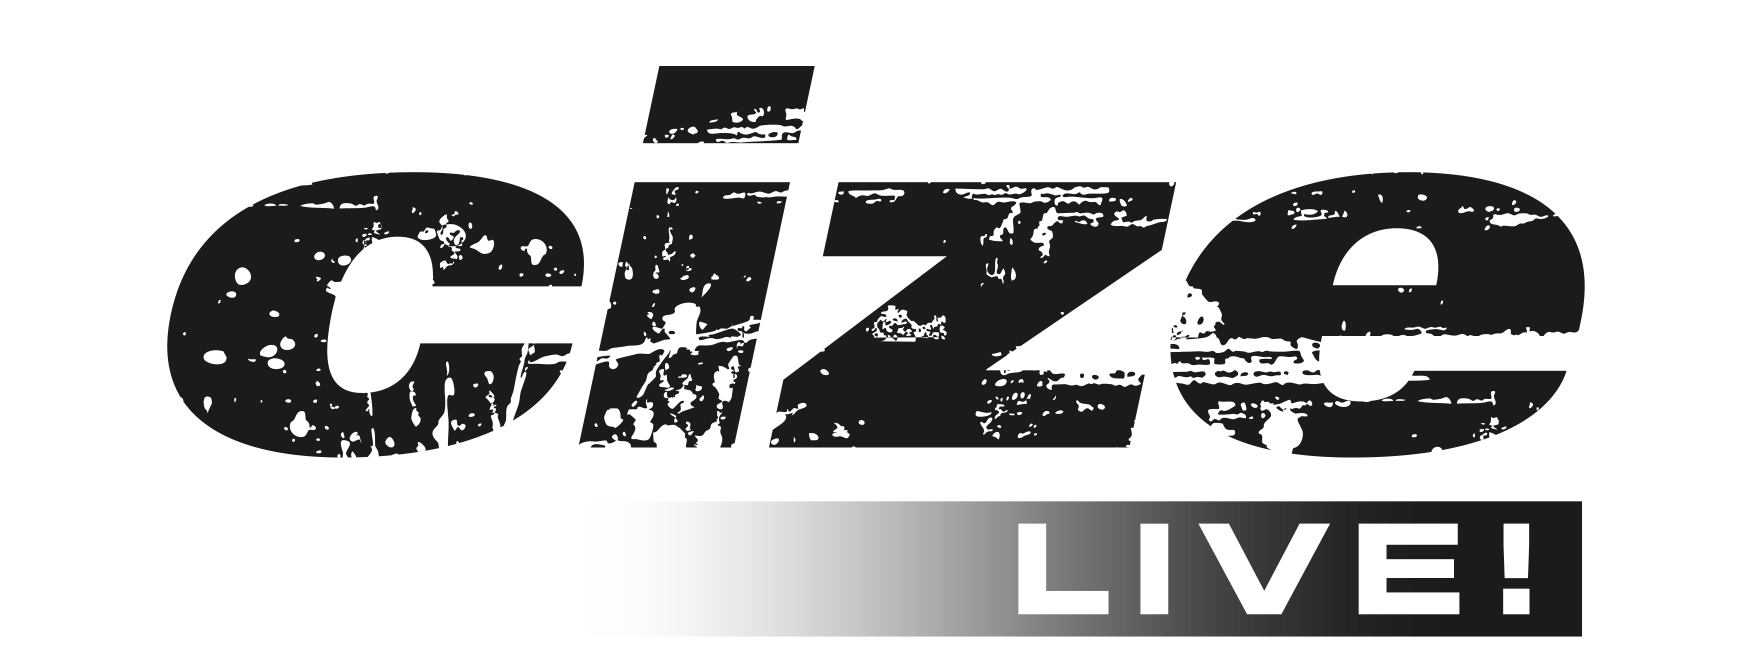 Cize_Live_Logos_Blk